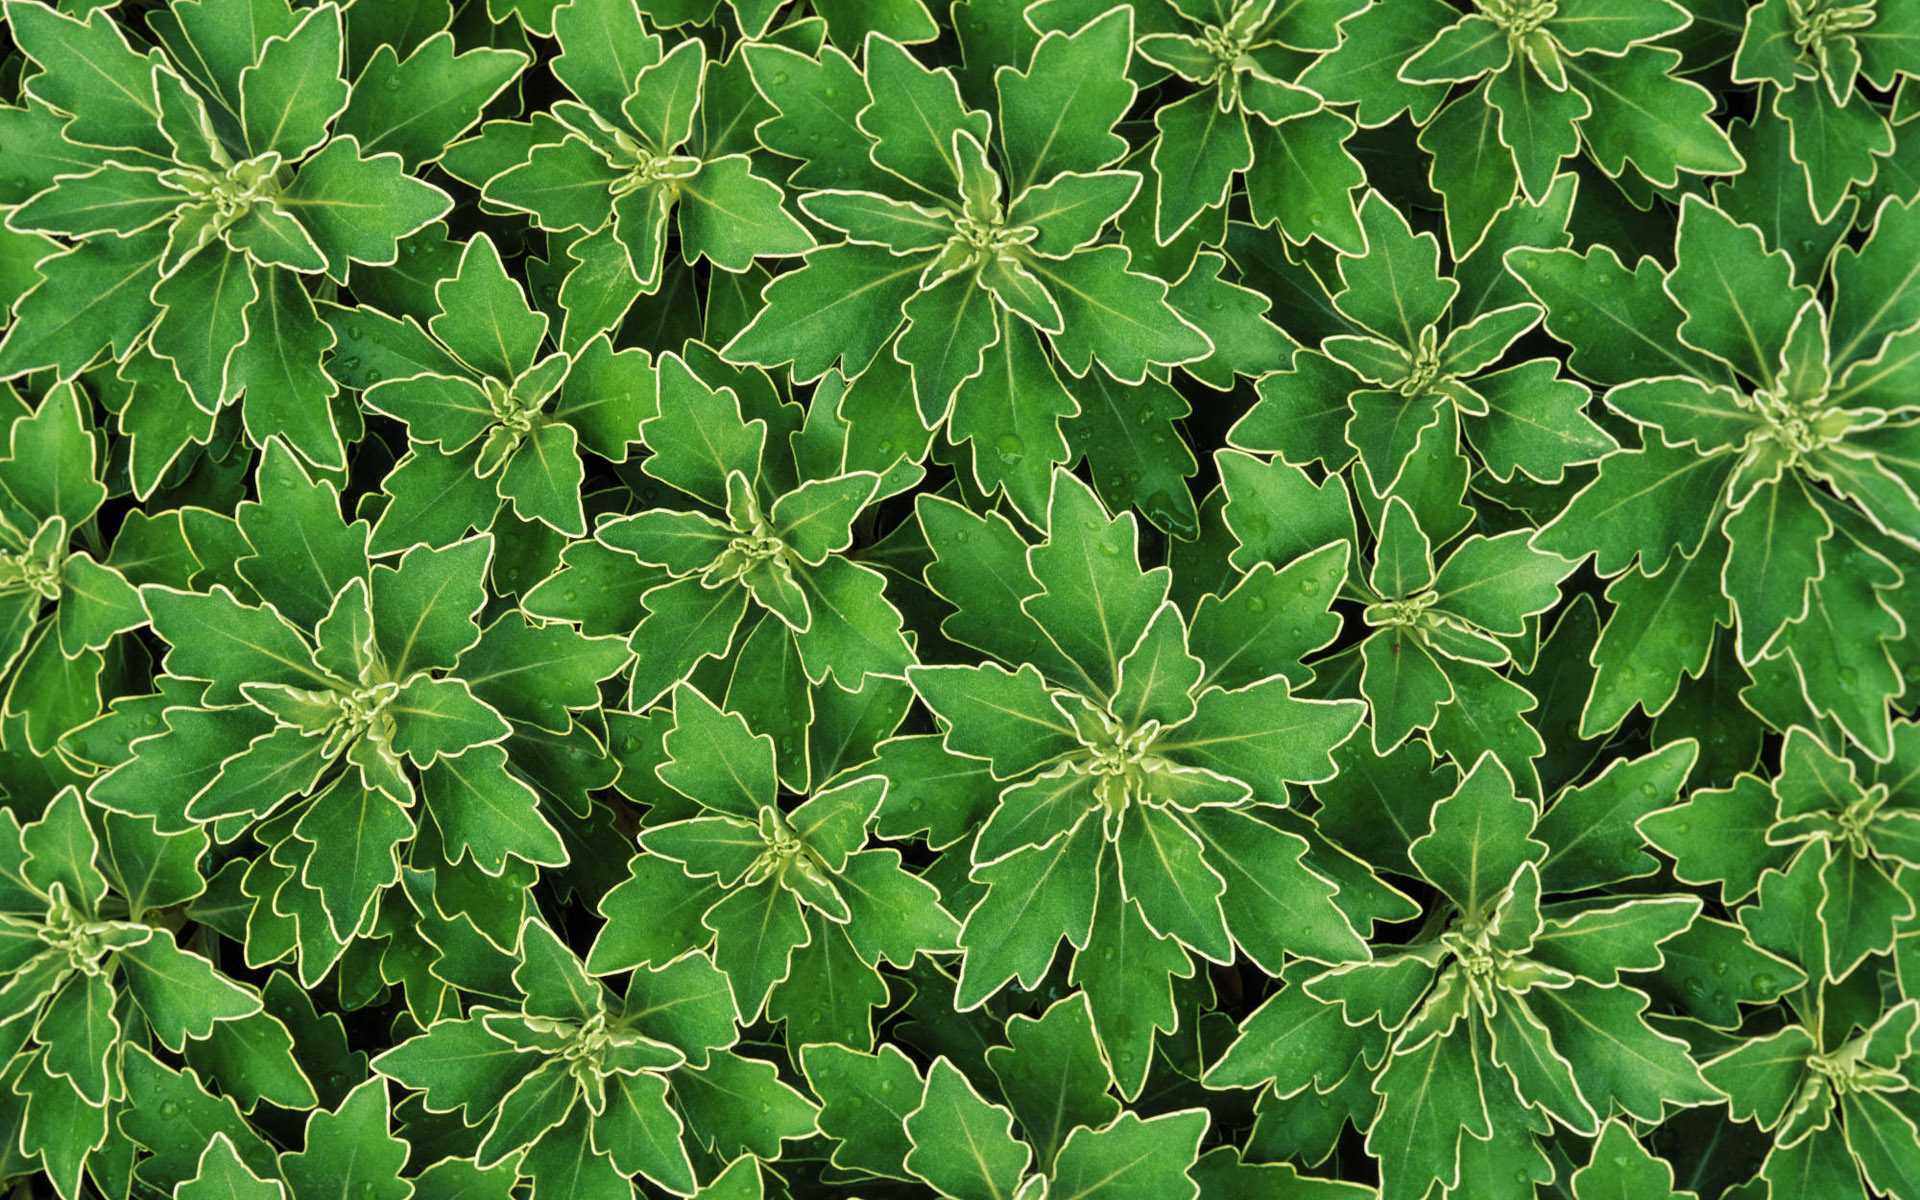 sedum plant hd wallpaper - photo #48